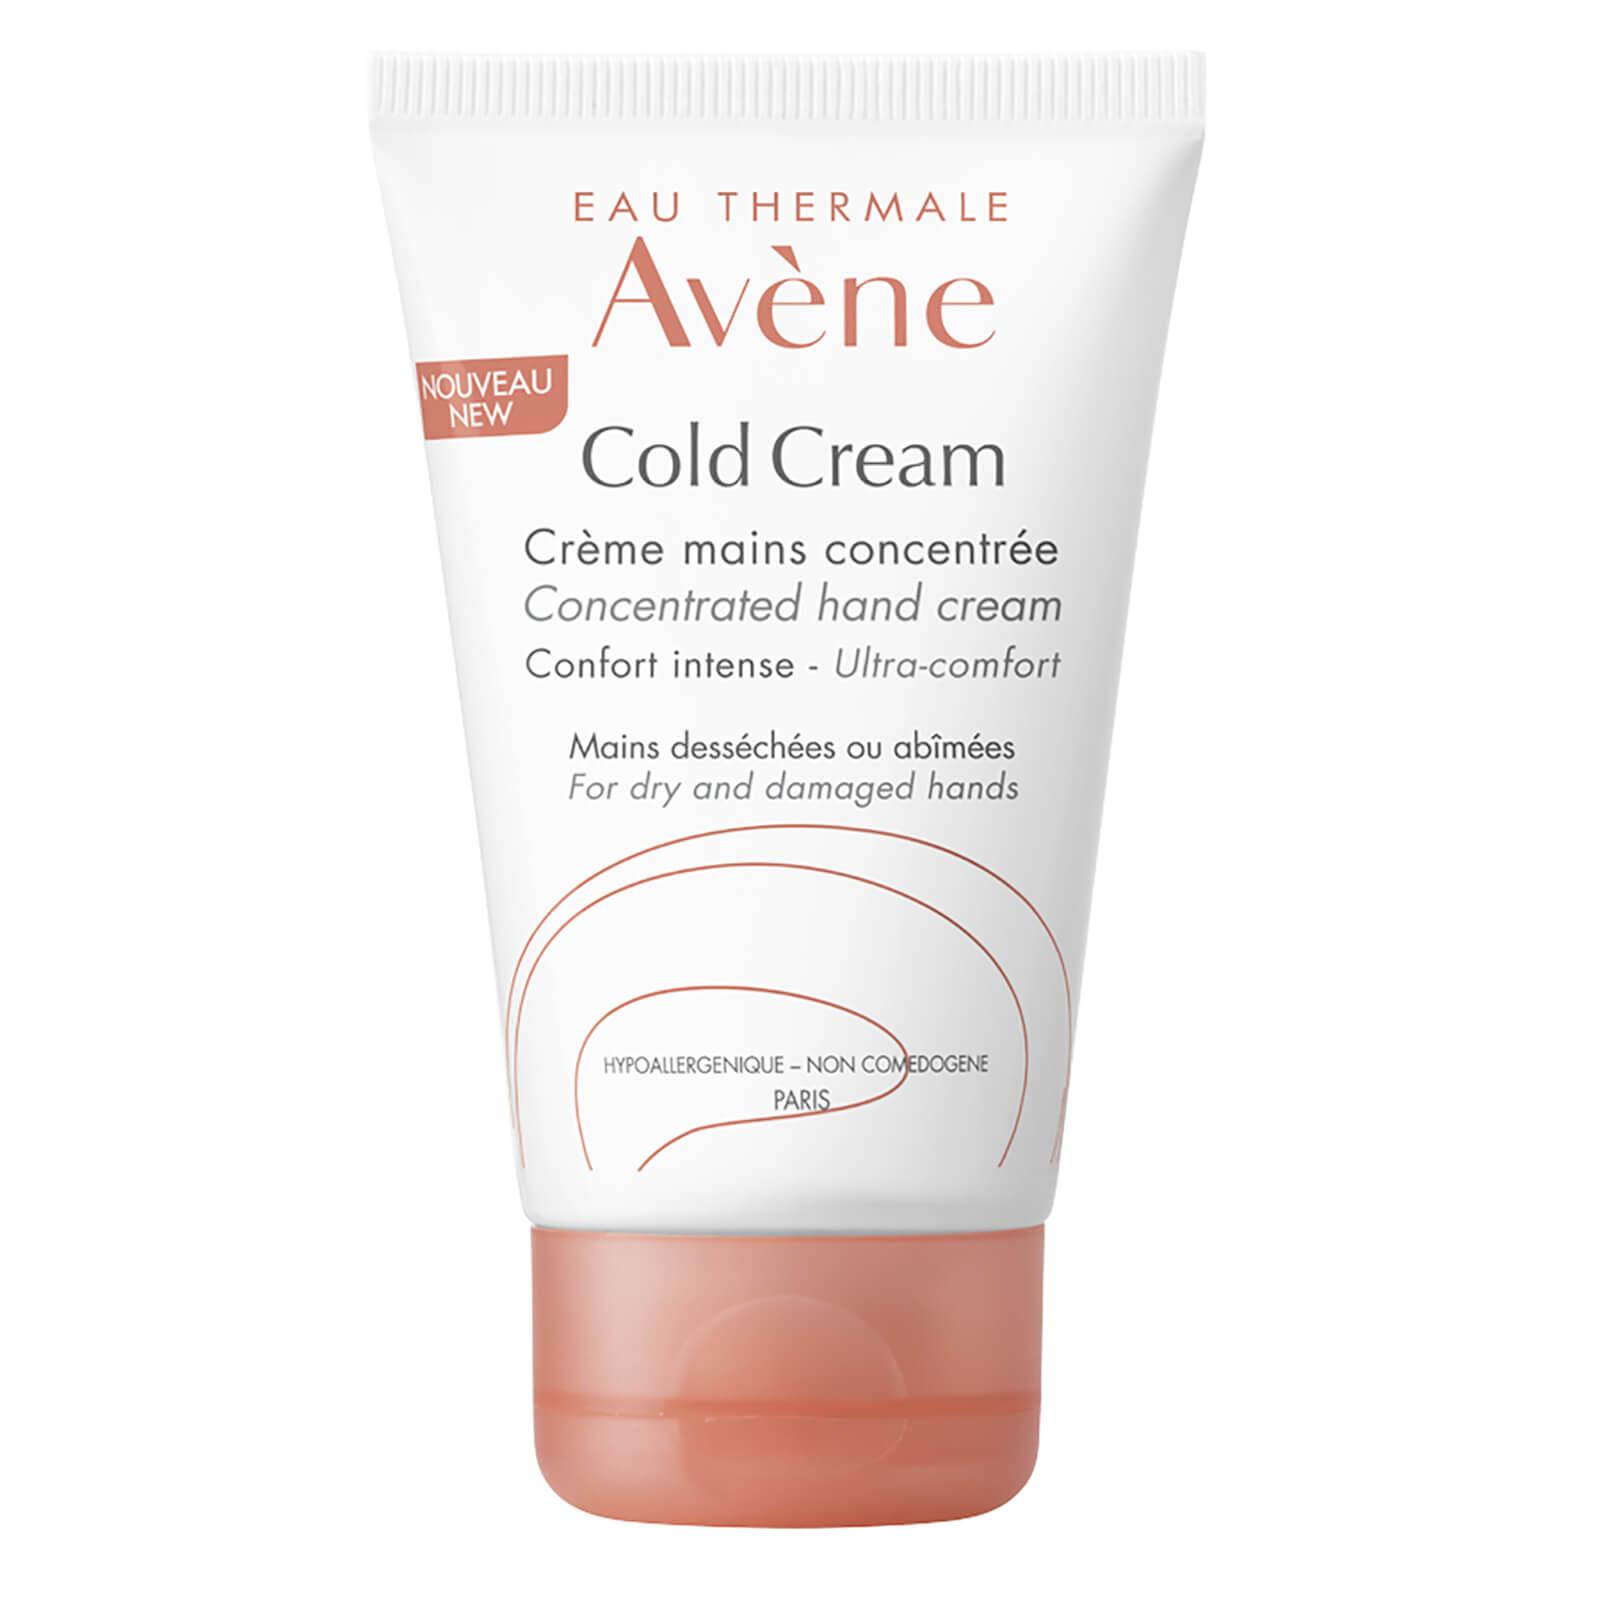 Crema de manos concentrada Cold Cream de Avène